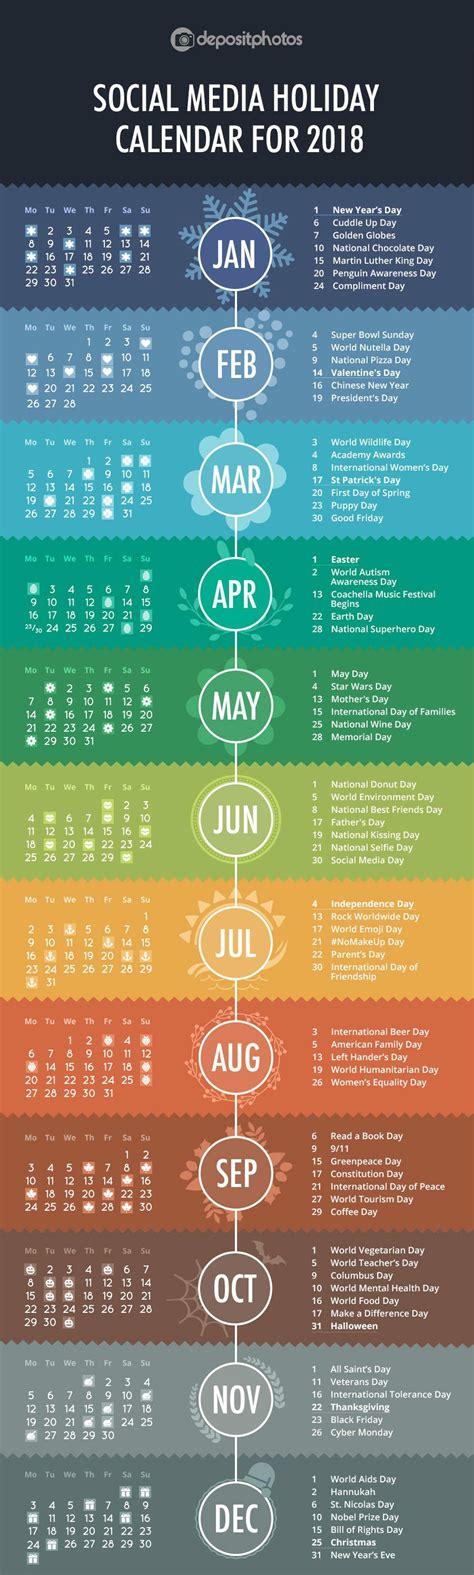 holiday event calendar infographic